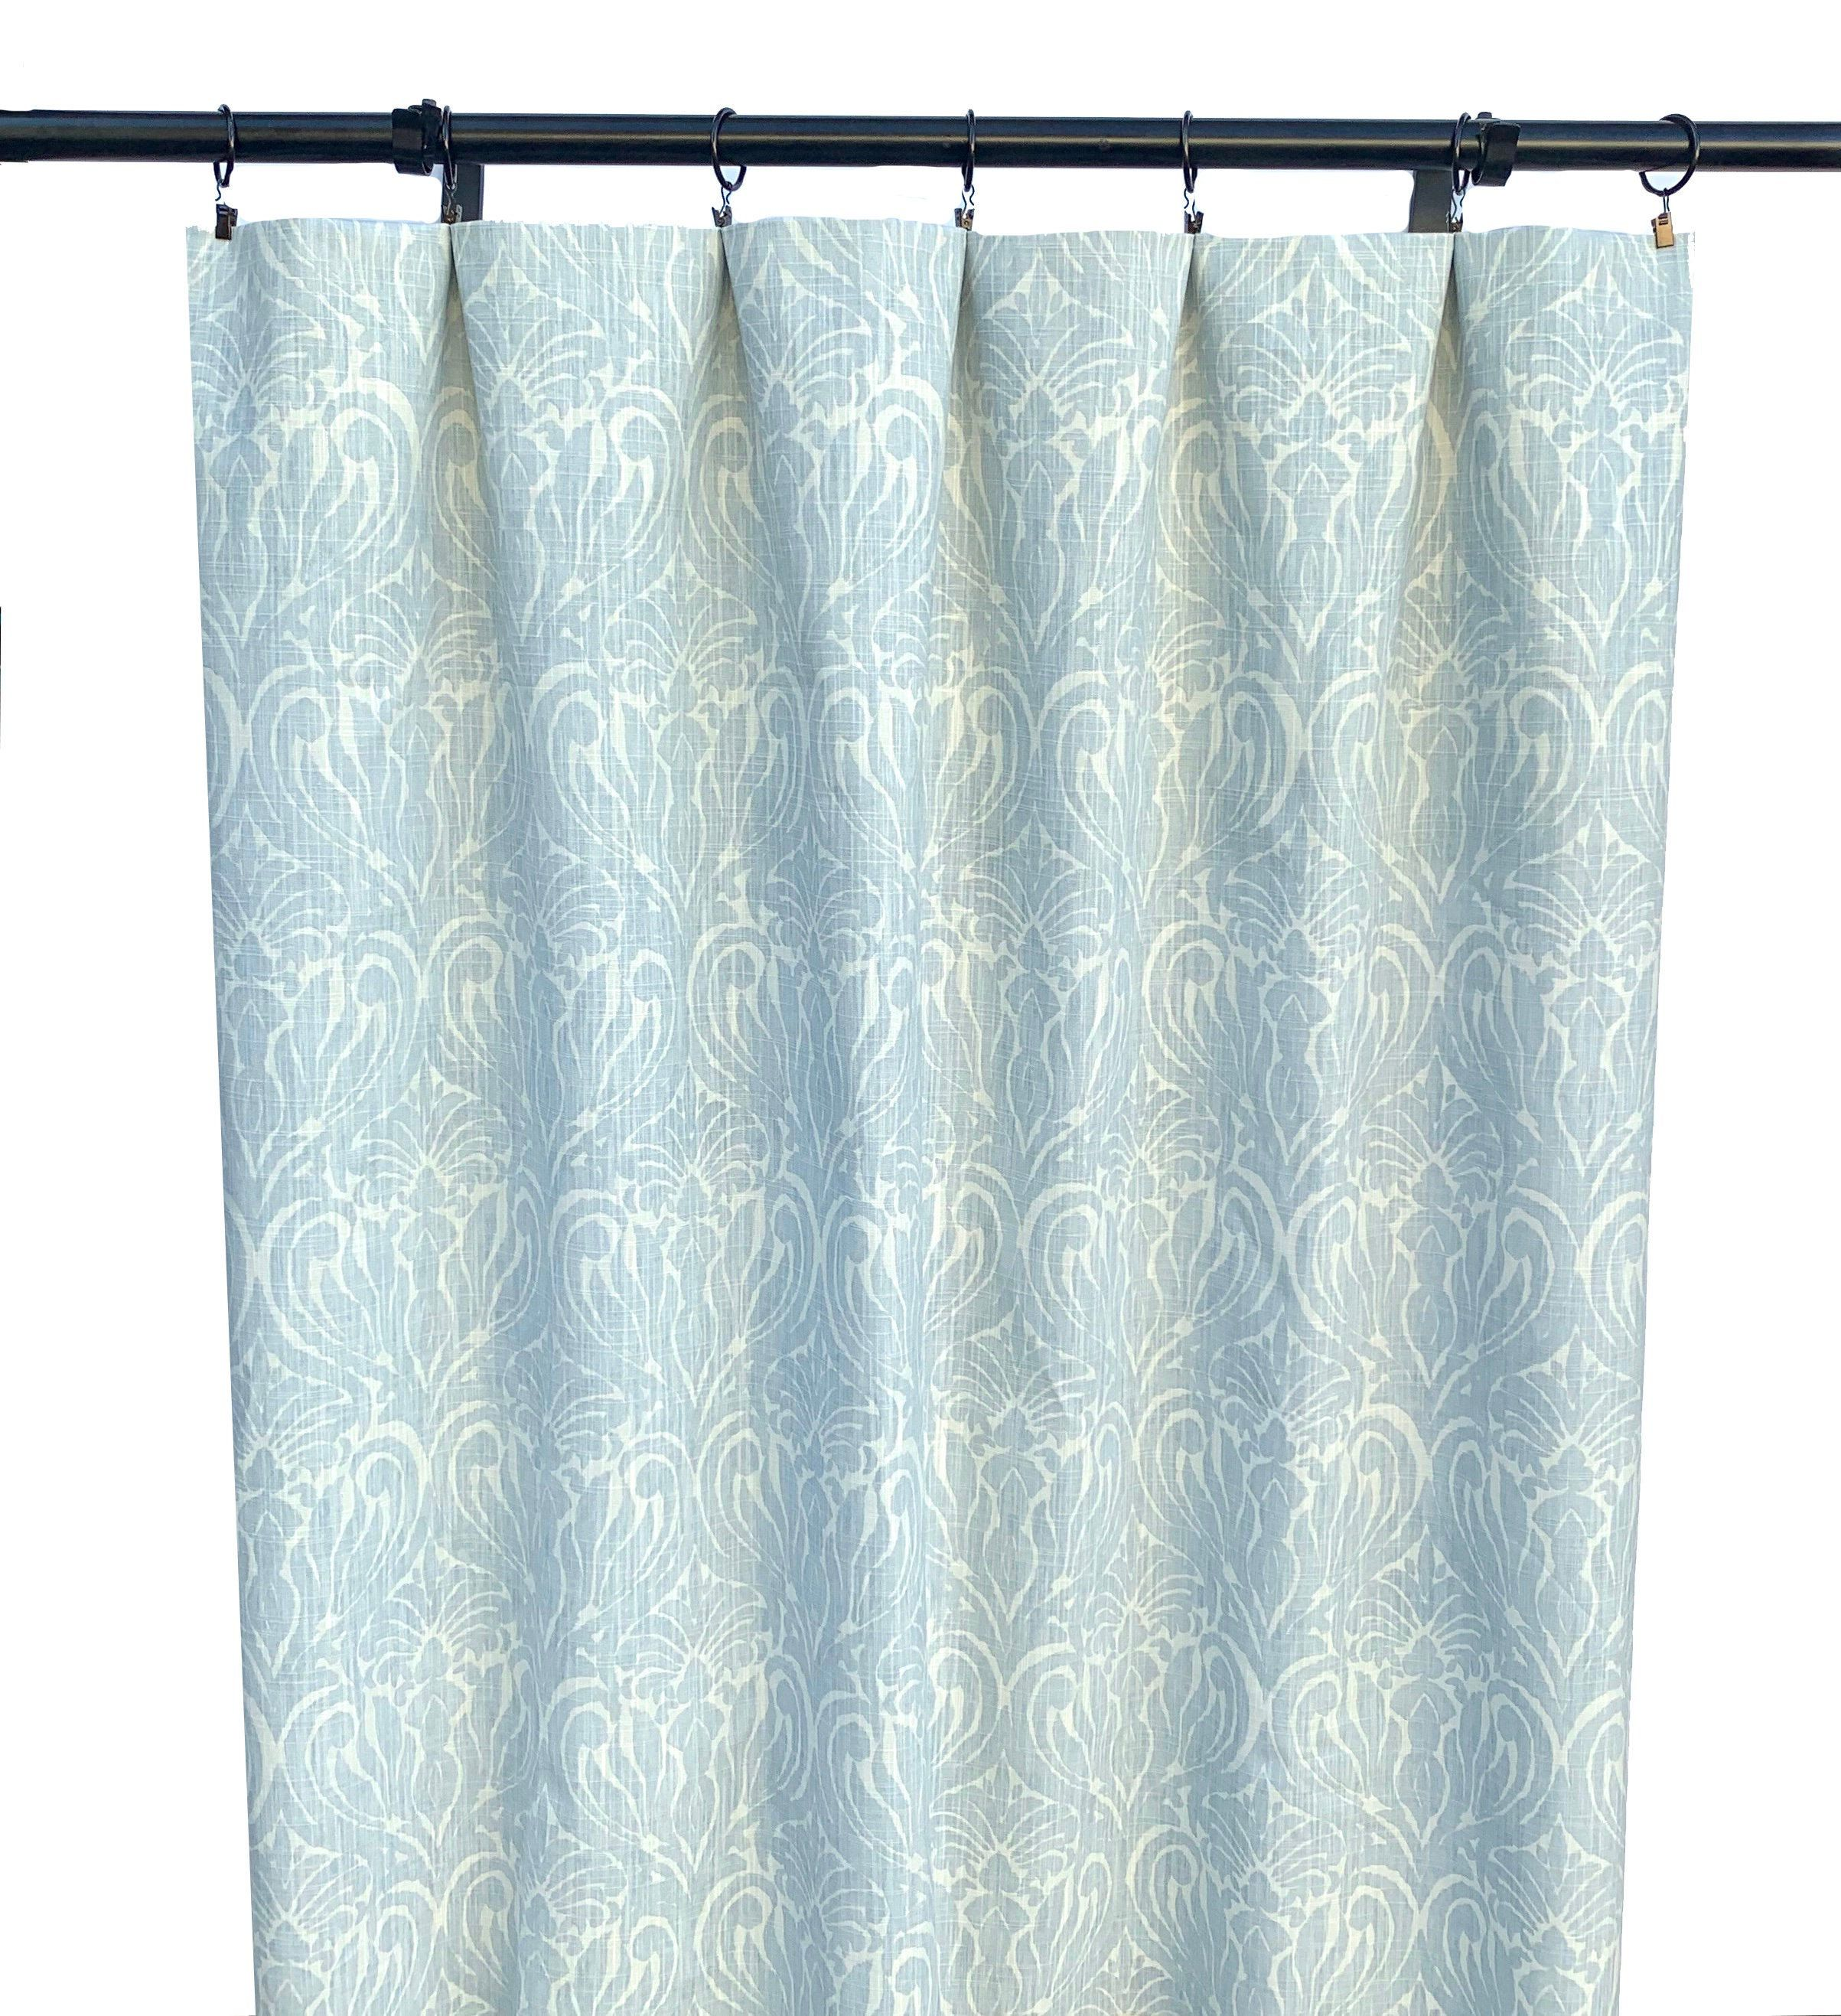 Ice Light Blue Curtain Panels 2 Curtain Panels Floral Blue Curtains Home Decor Grey Blue Floral Print Curtain In 2020 Light Blue Curtains Printed Curtains Blue Curtains